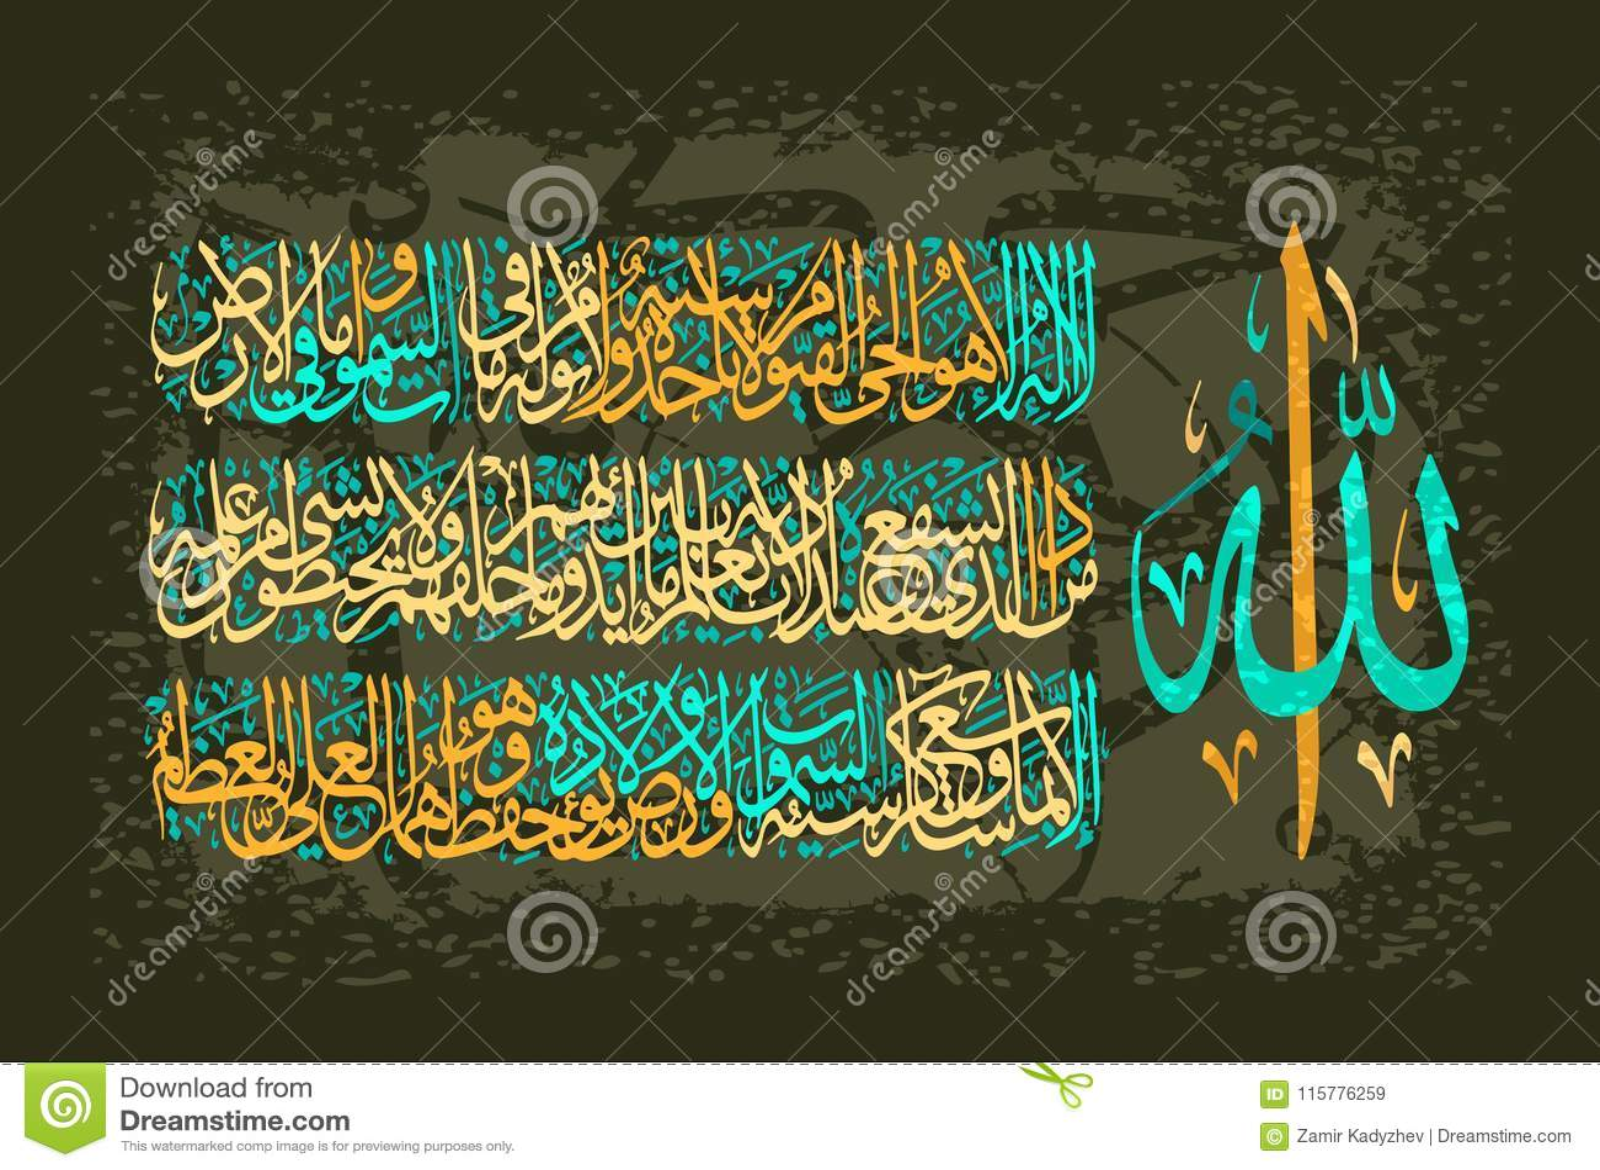 Arabic Calligraphy 255 Ayah, Sura Al Bakara Al-Kursi Means `Throne